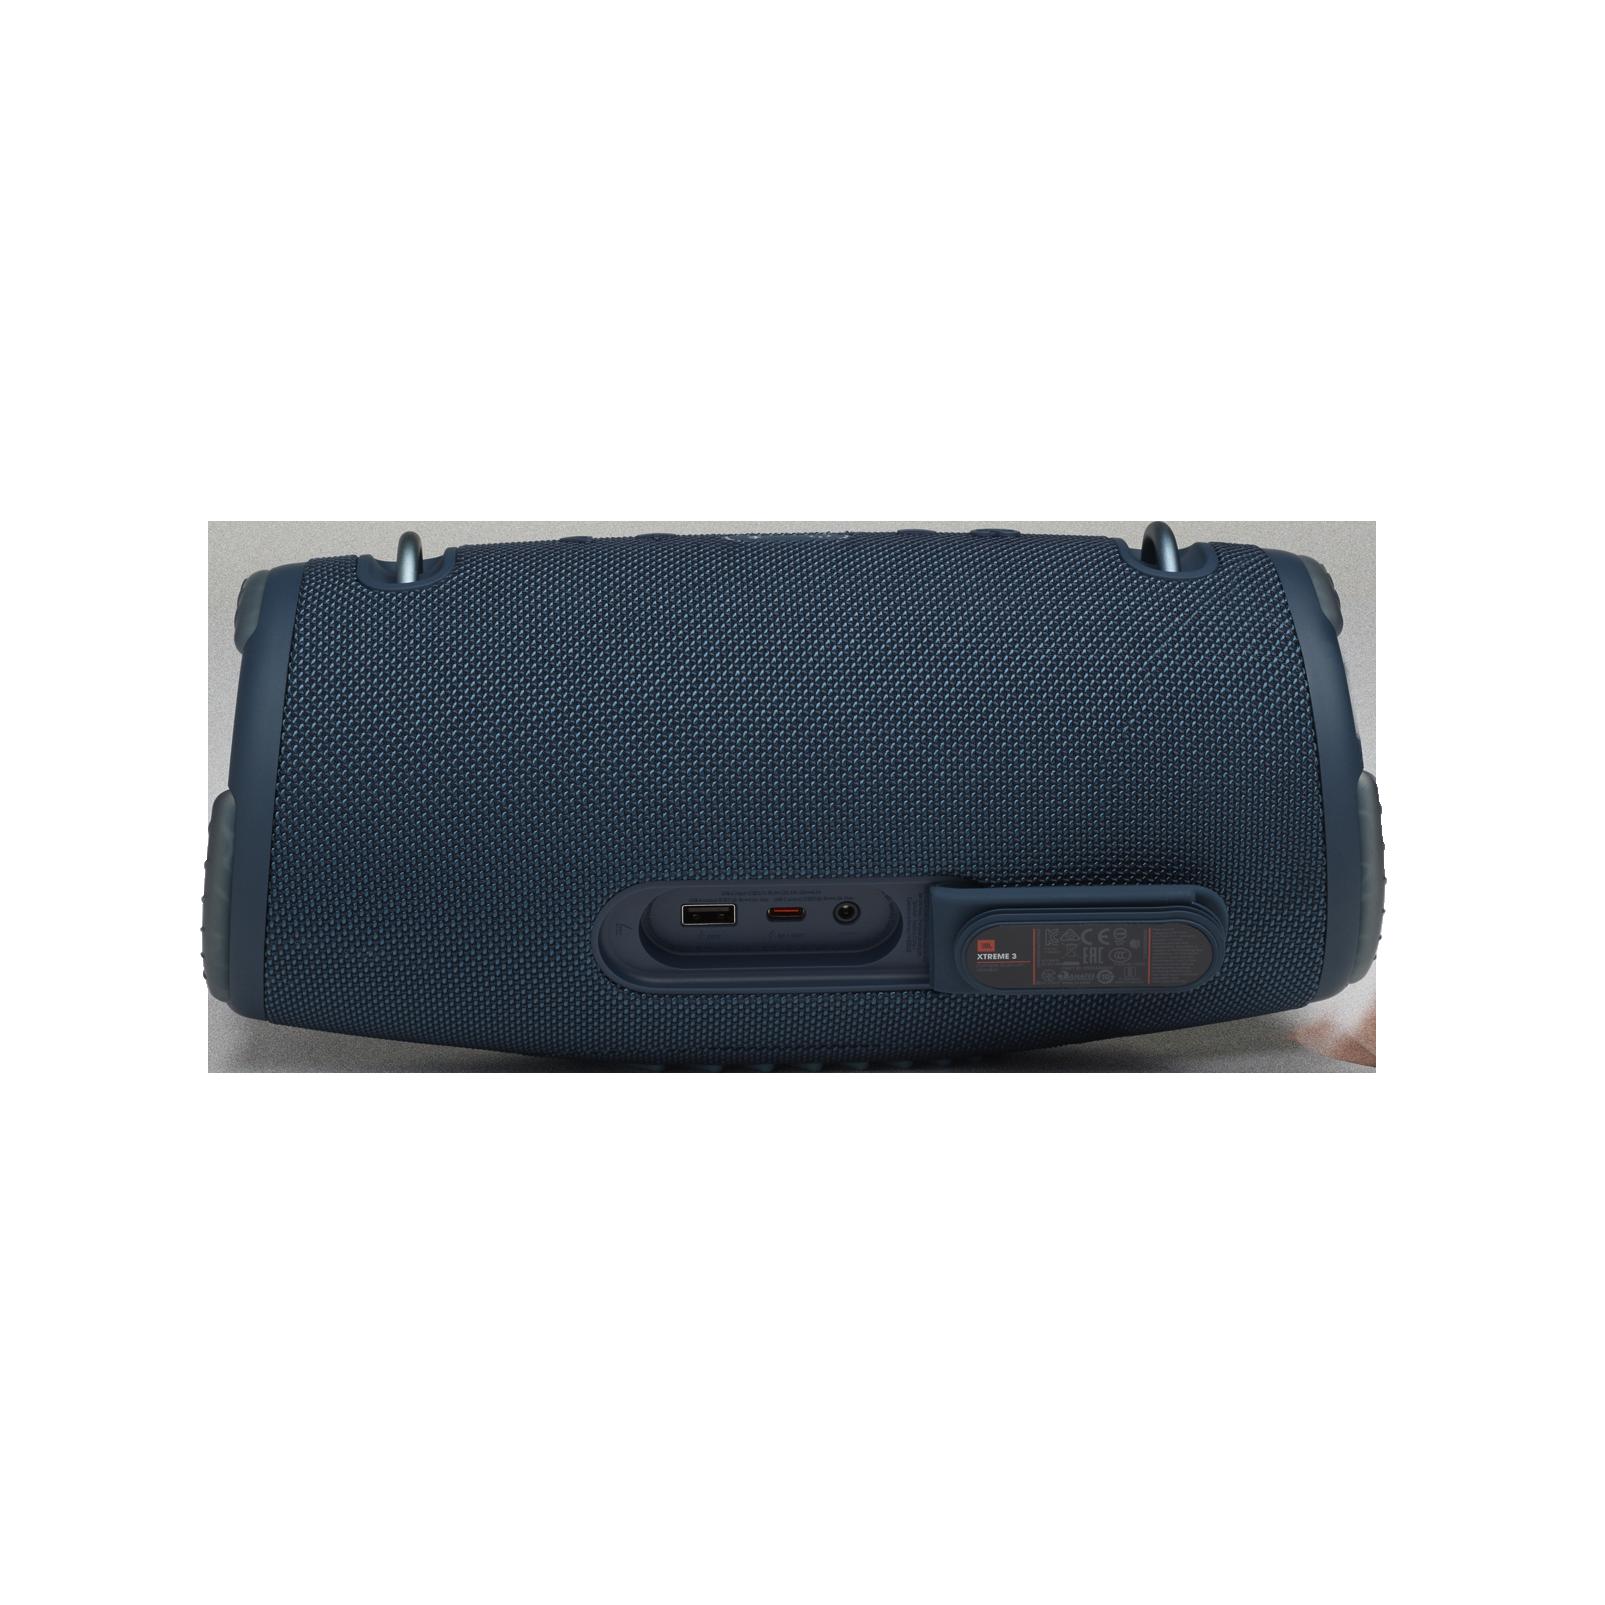 JBL Xtreme 3 - Blue - Portable waterproof speaker - Detailshot 2